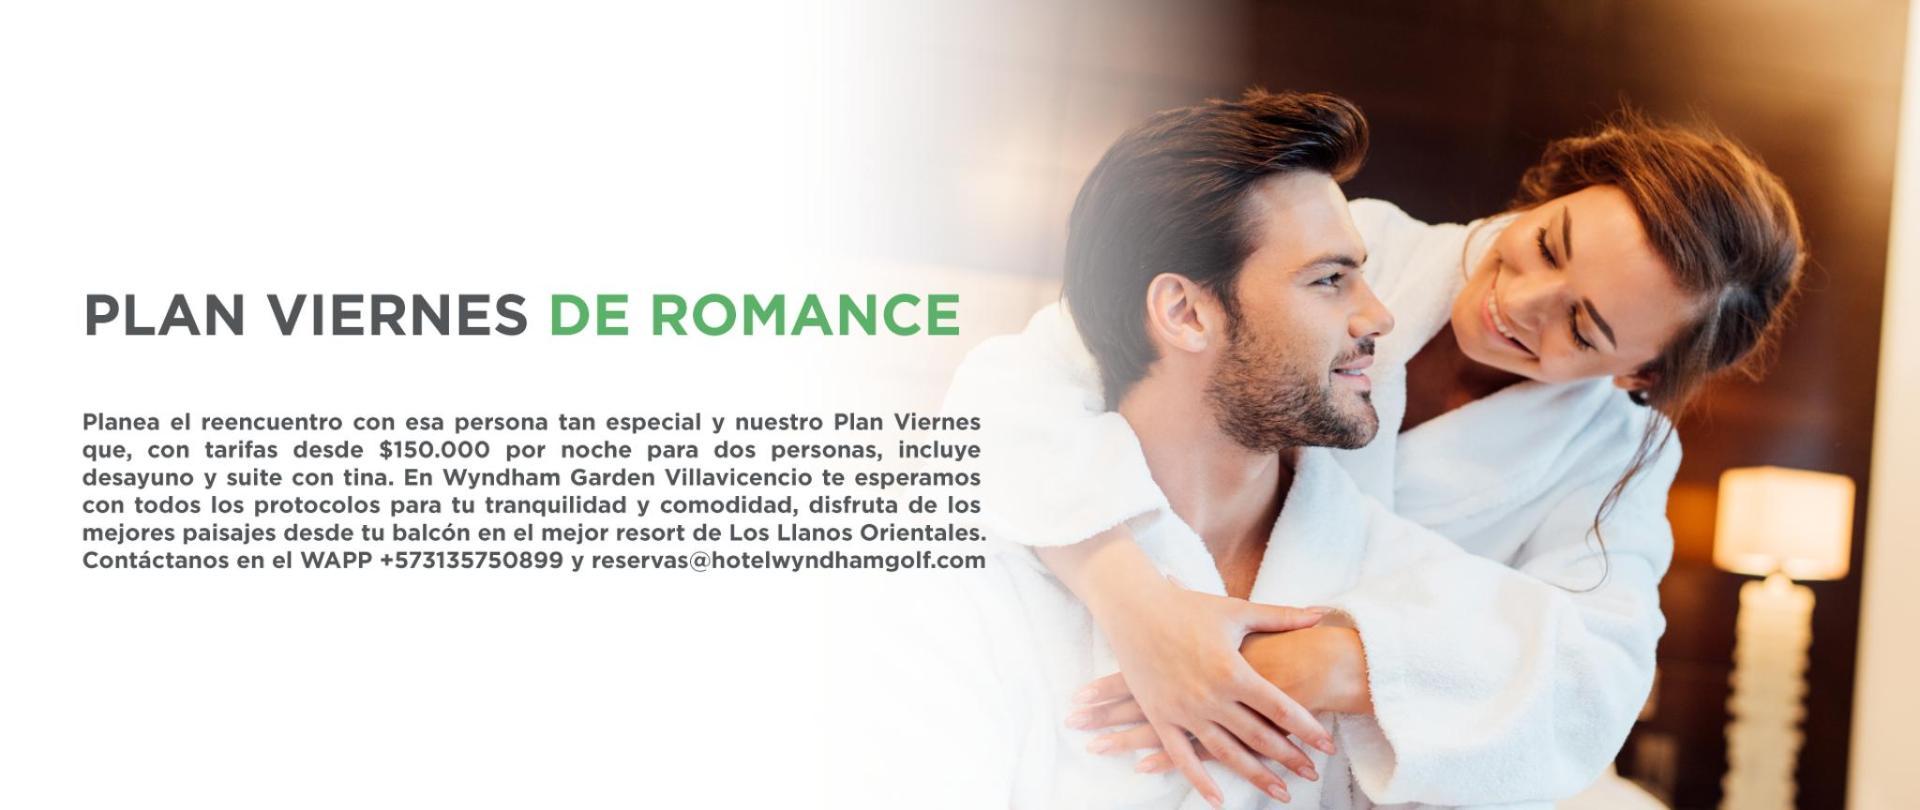 BANNER-WEB-PLAN-ROMANTICO.png